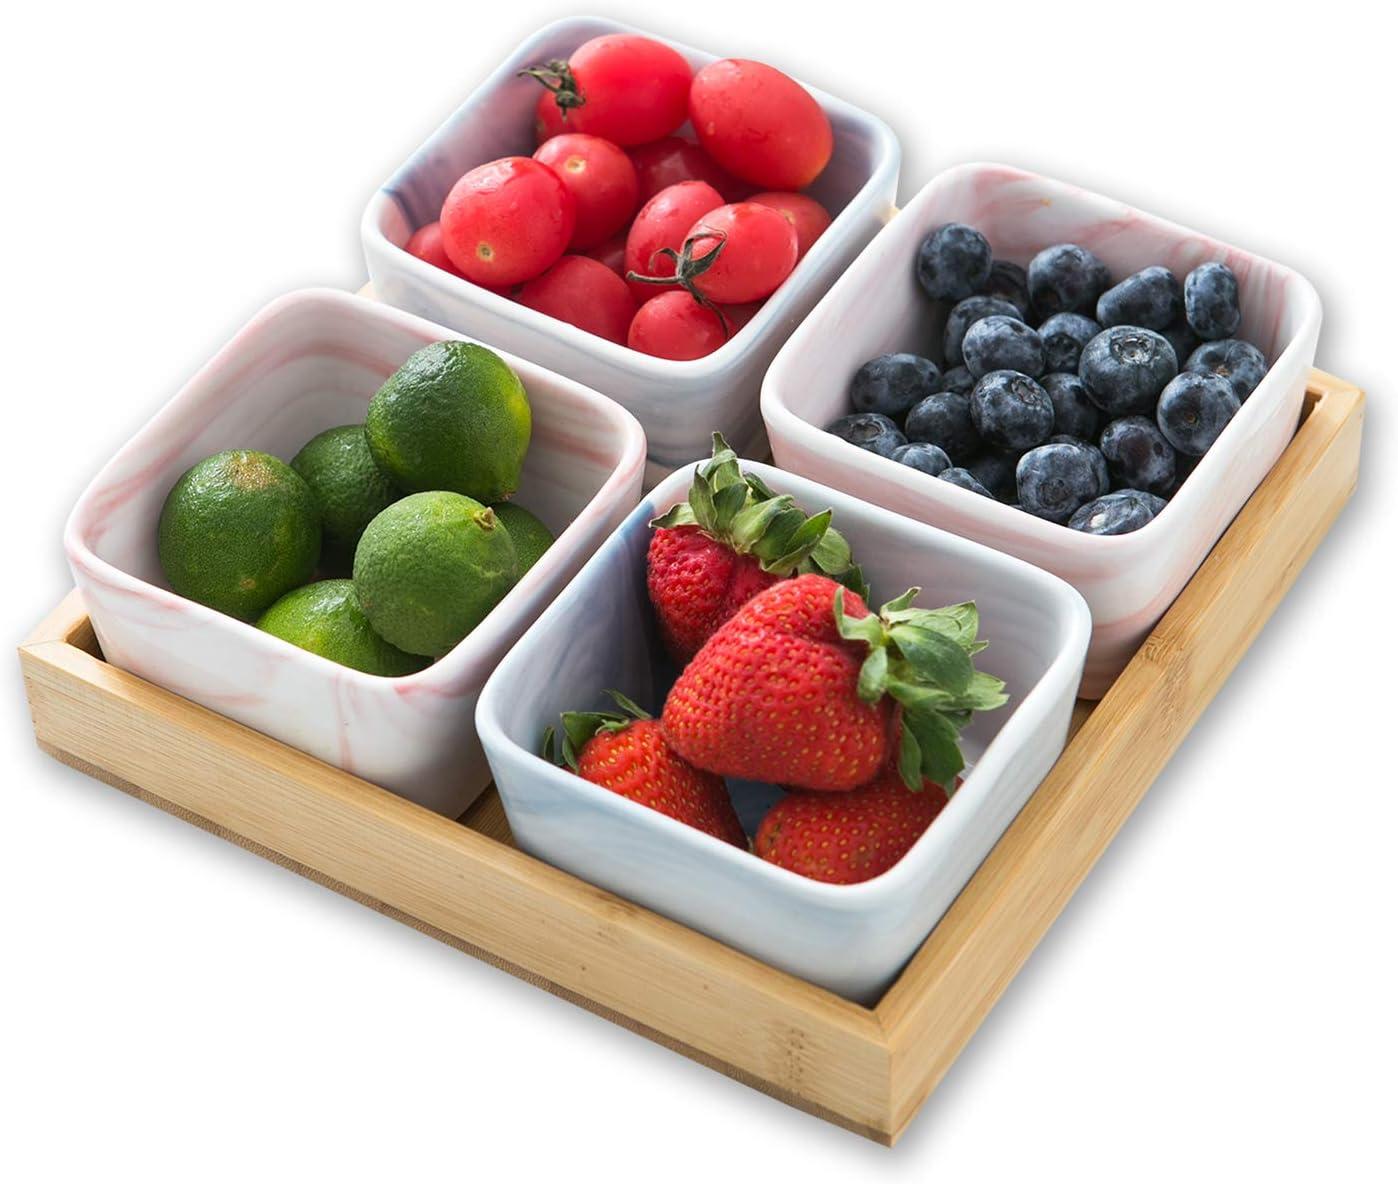 Sazaki 3.5 Inch Snack Dishes, Square Snack Bowls Small Serving Tray, Porcelain Appetizer Serving Bowl Set For Dessert, Snack, Salad and Finger Food, Set of 4 in 2 Color